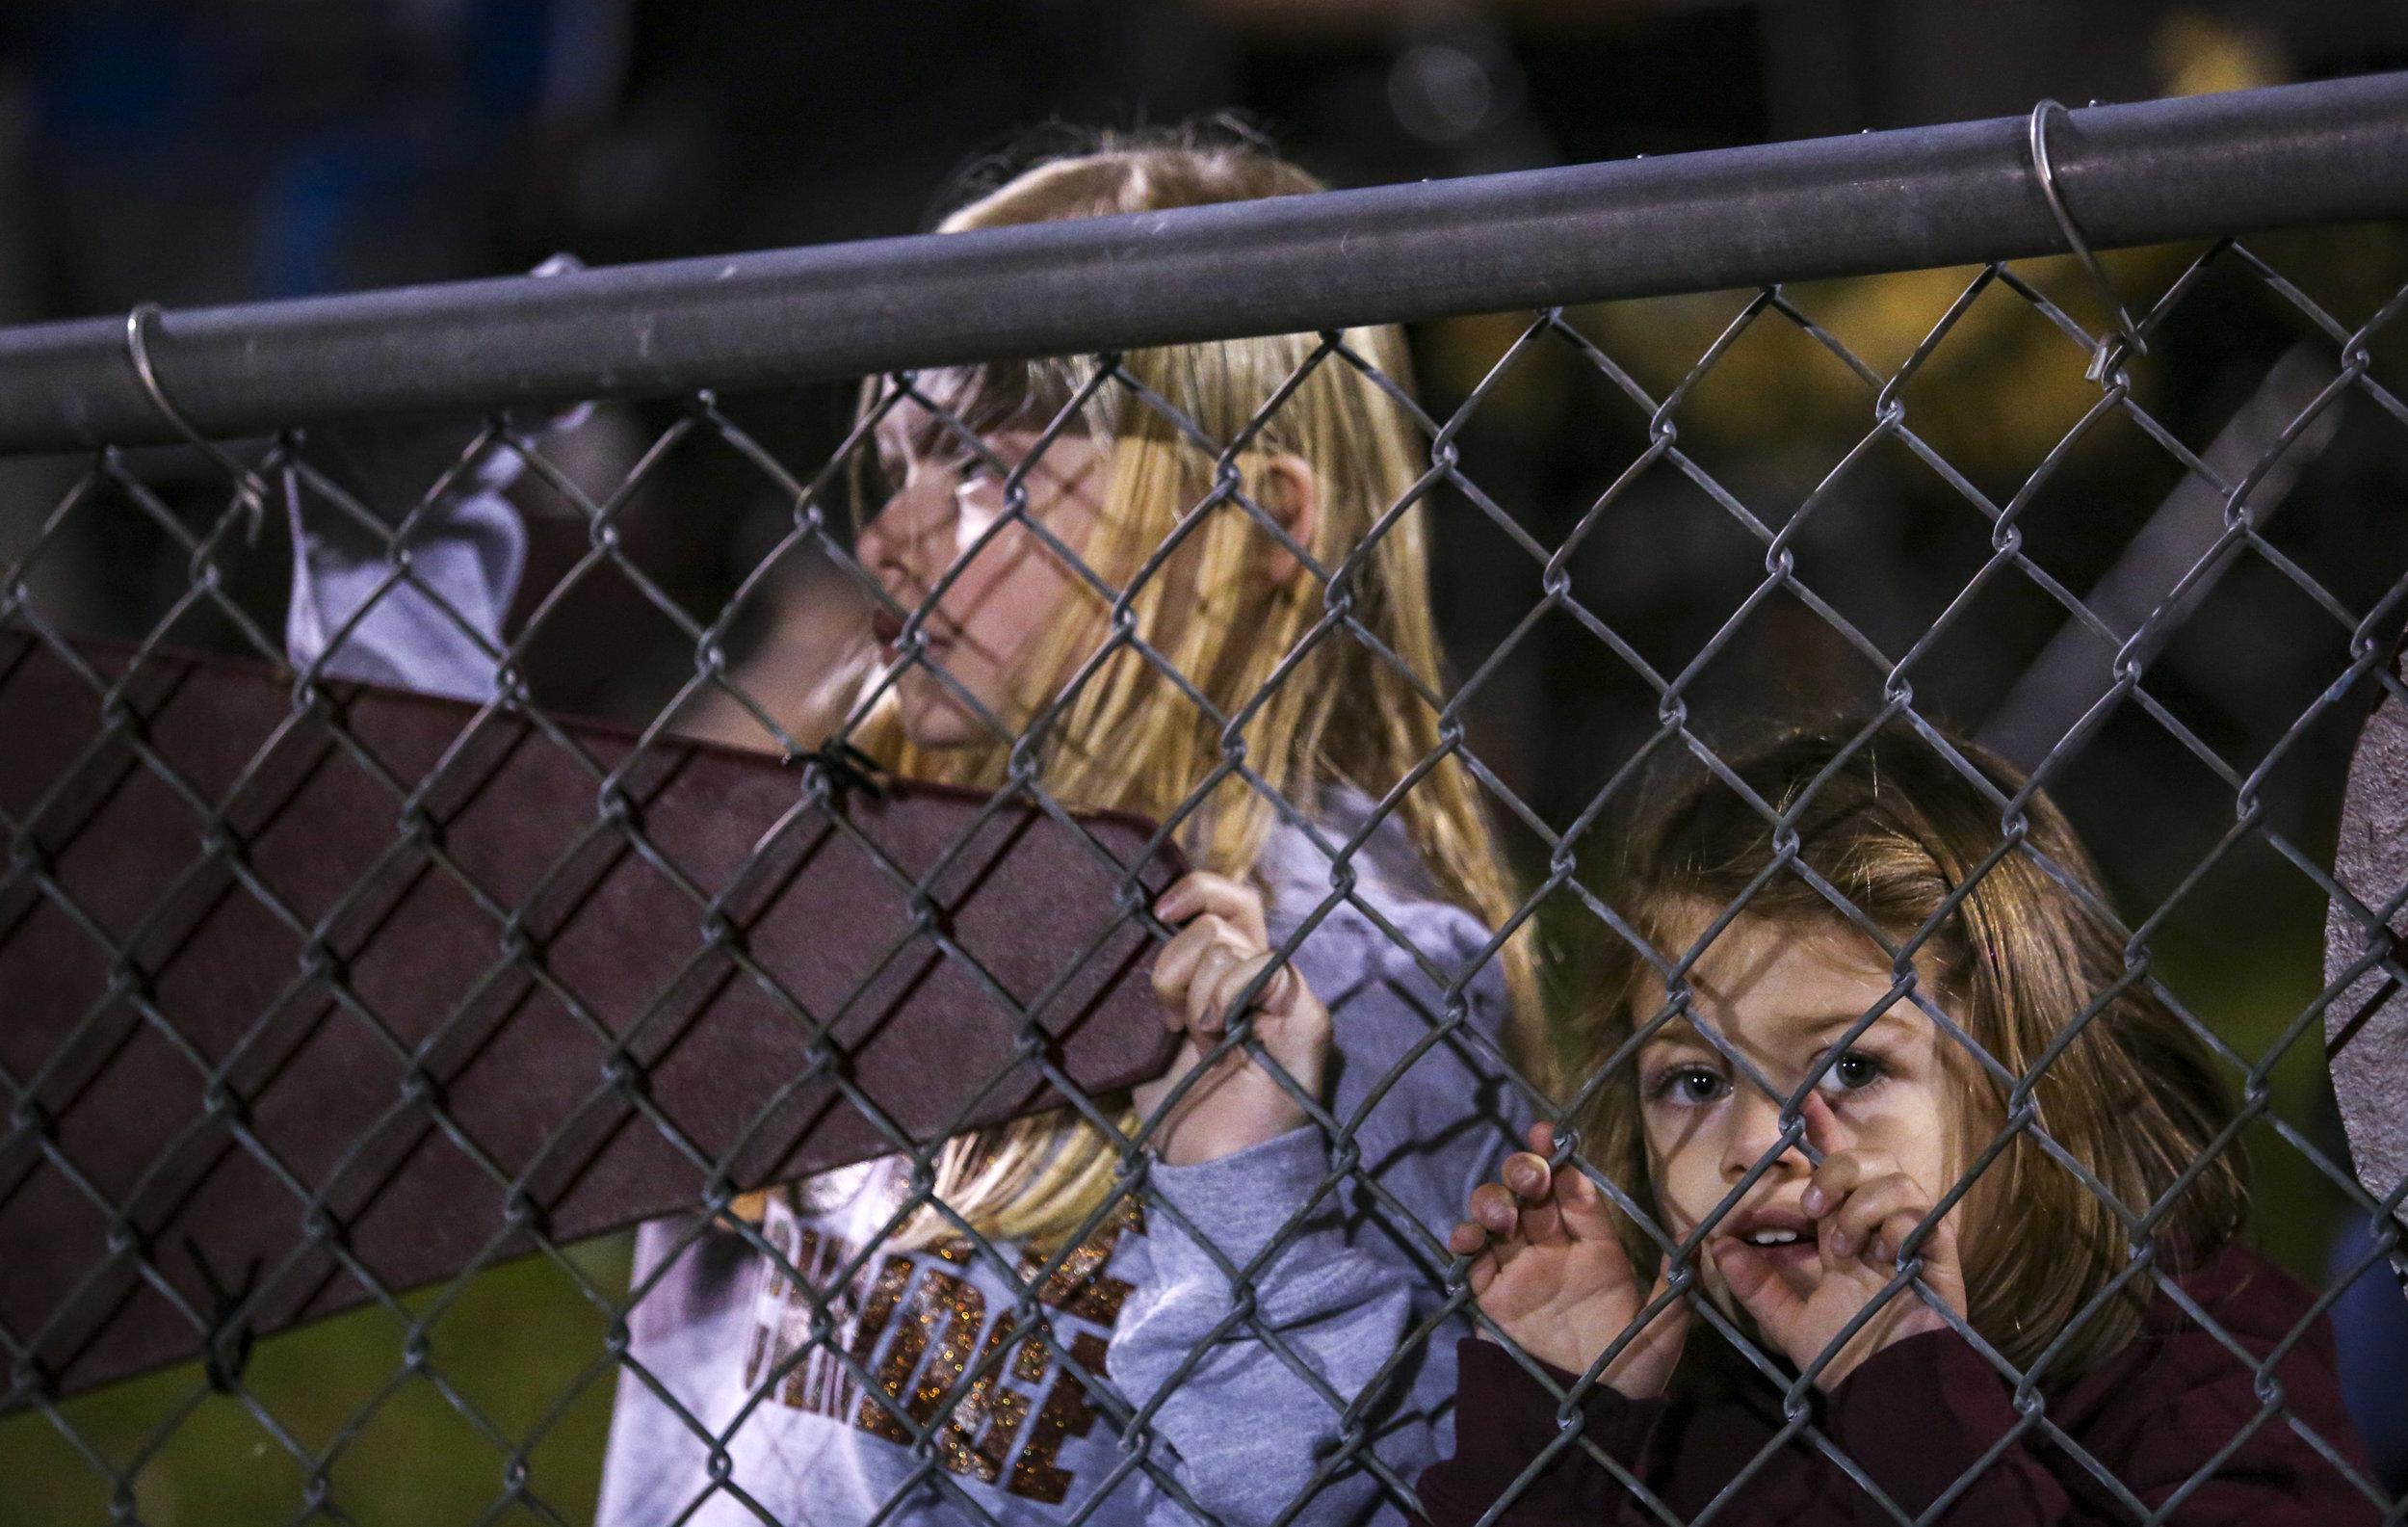 Zoe, 4, and Addison Clarke, 7, of Taylor Ridge watch senior night ceremonies before the varsity football game at Rockridge High School in Edginton, Friday, October 20, 2017.